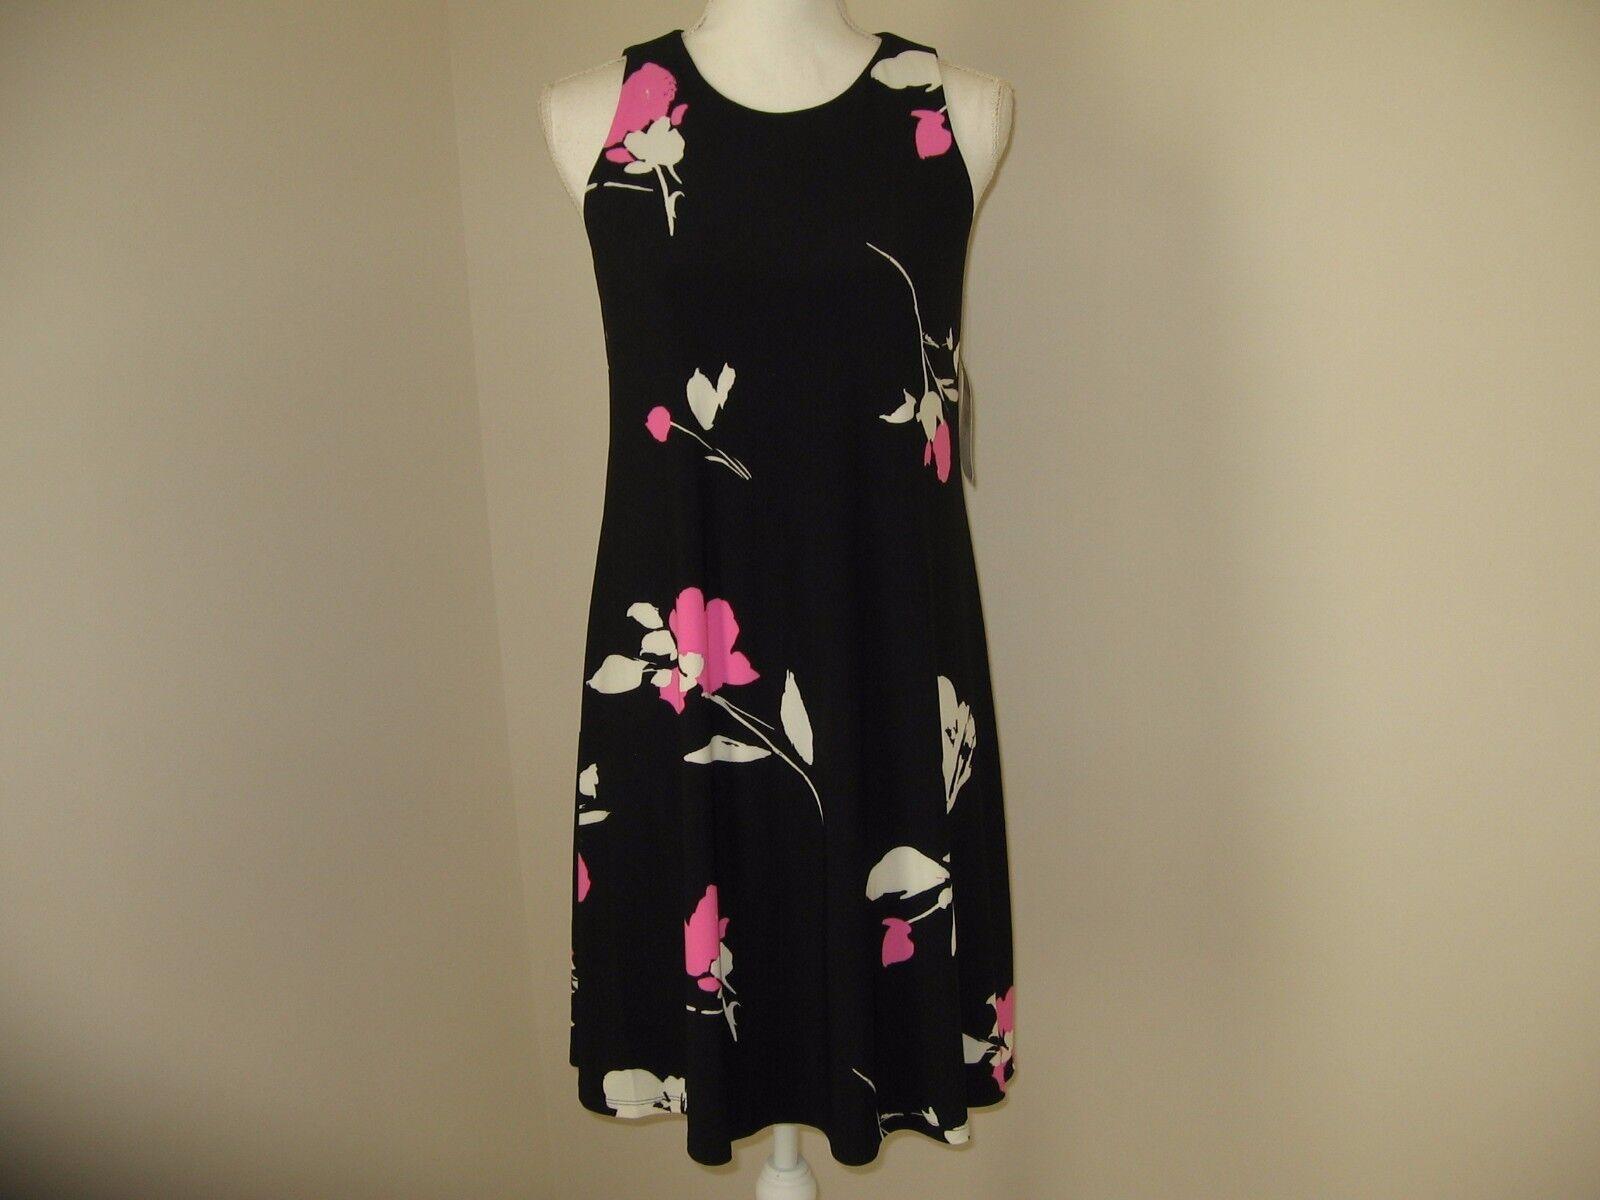 Lauren Ralph Lauren Floral A-Line Dress SIZE 4 NWT MSRP